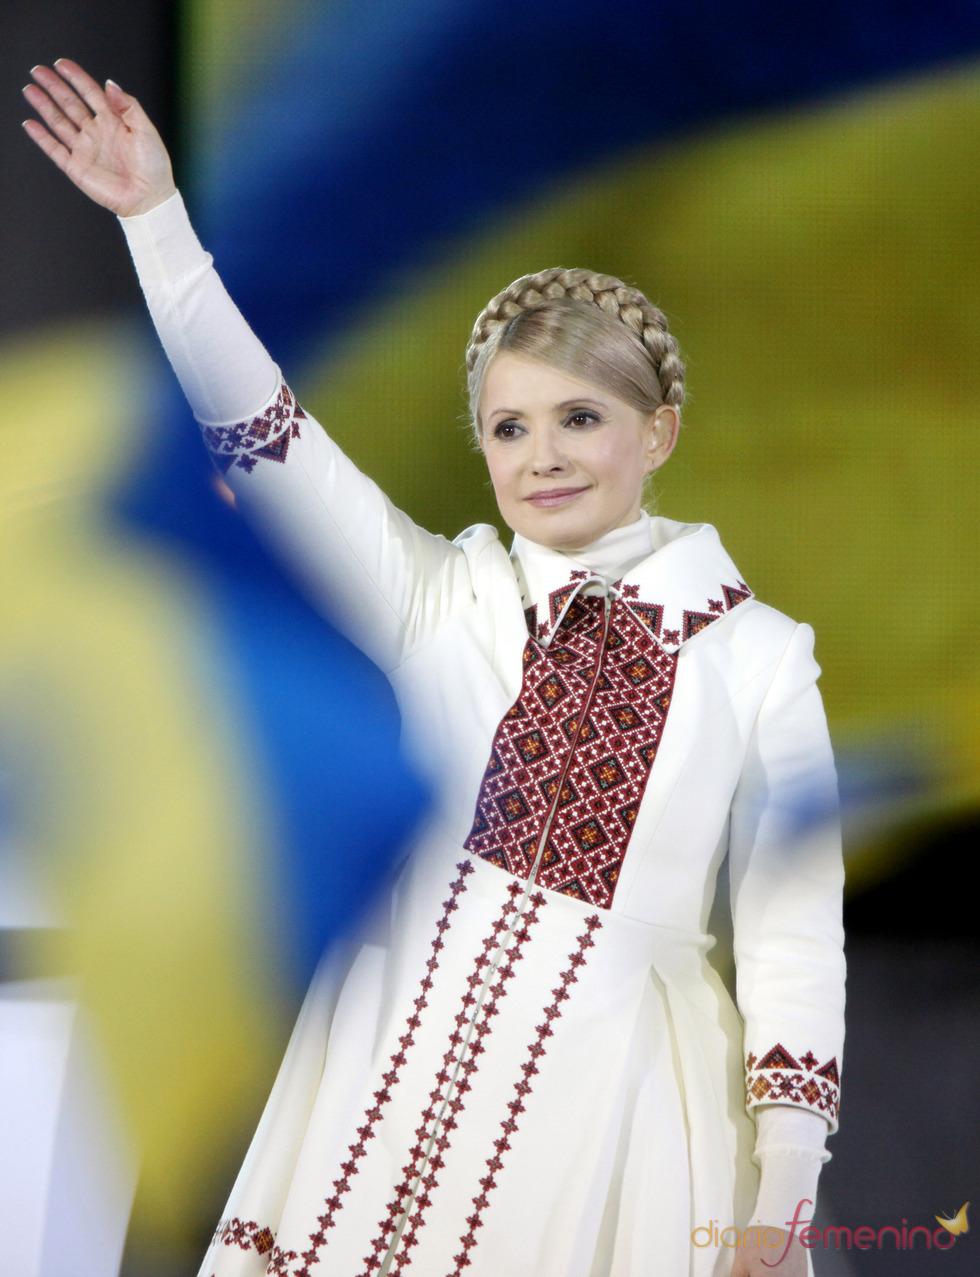 Yulia Tymoshenko primera dama ucraniana